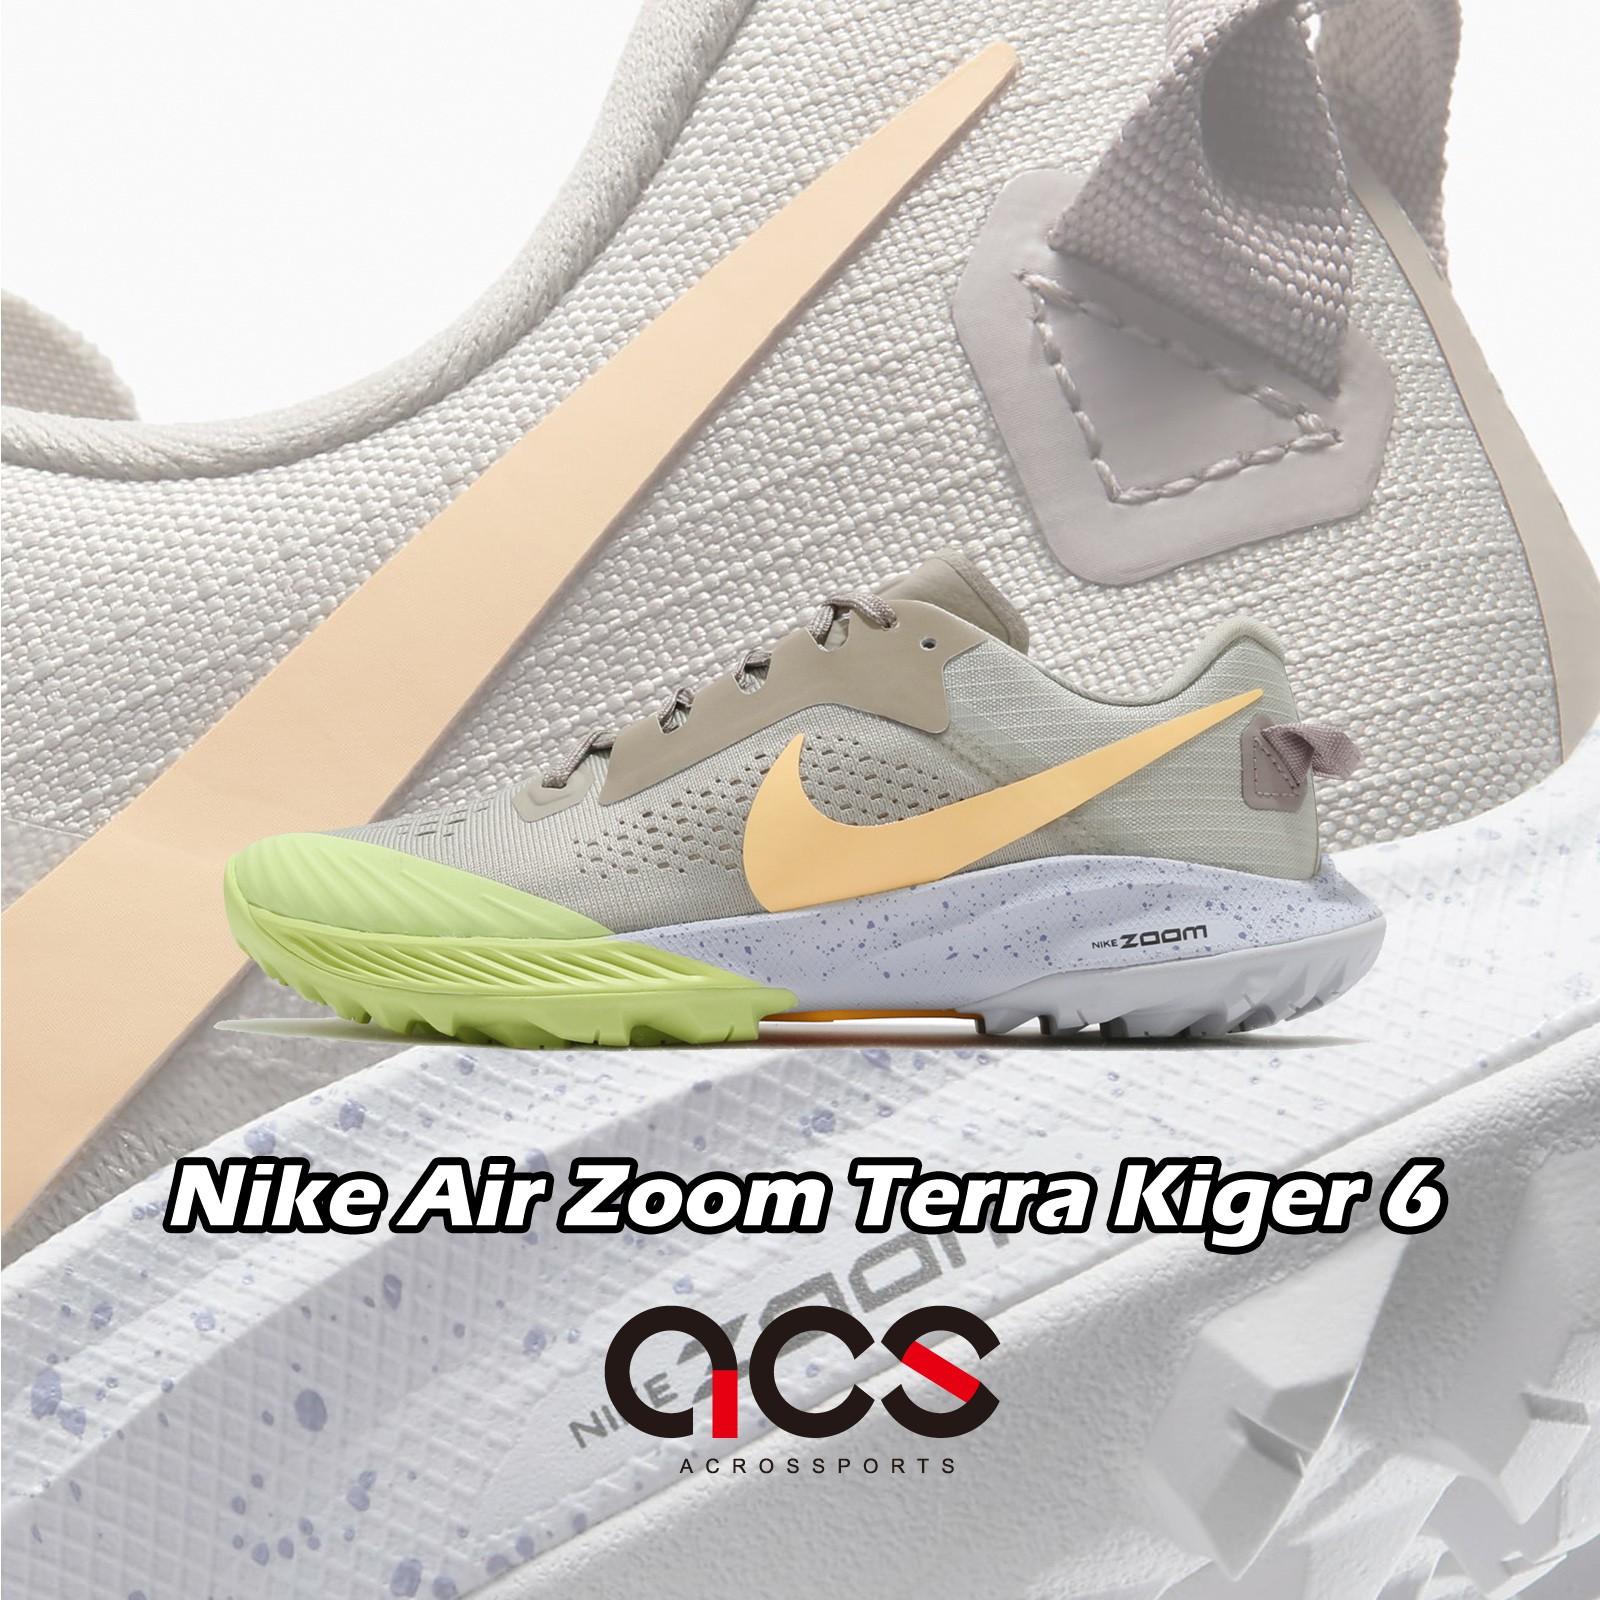 Nike 越野跑鞋 Wmns Air Zoom Terra Kiger 6 灰黃綠 女鞋【ACS】 CJ0220-200